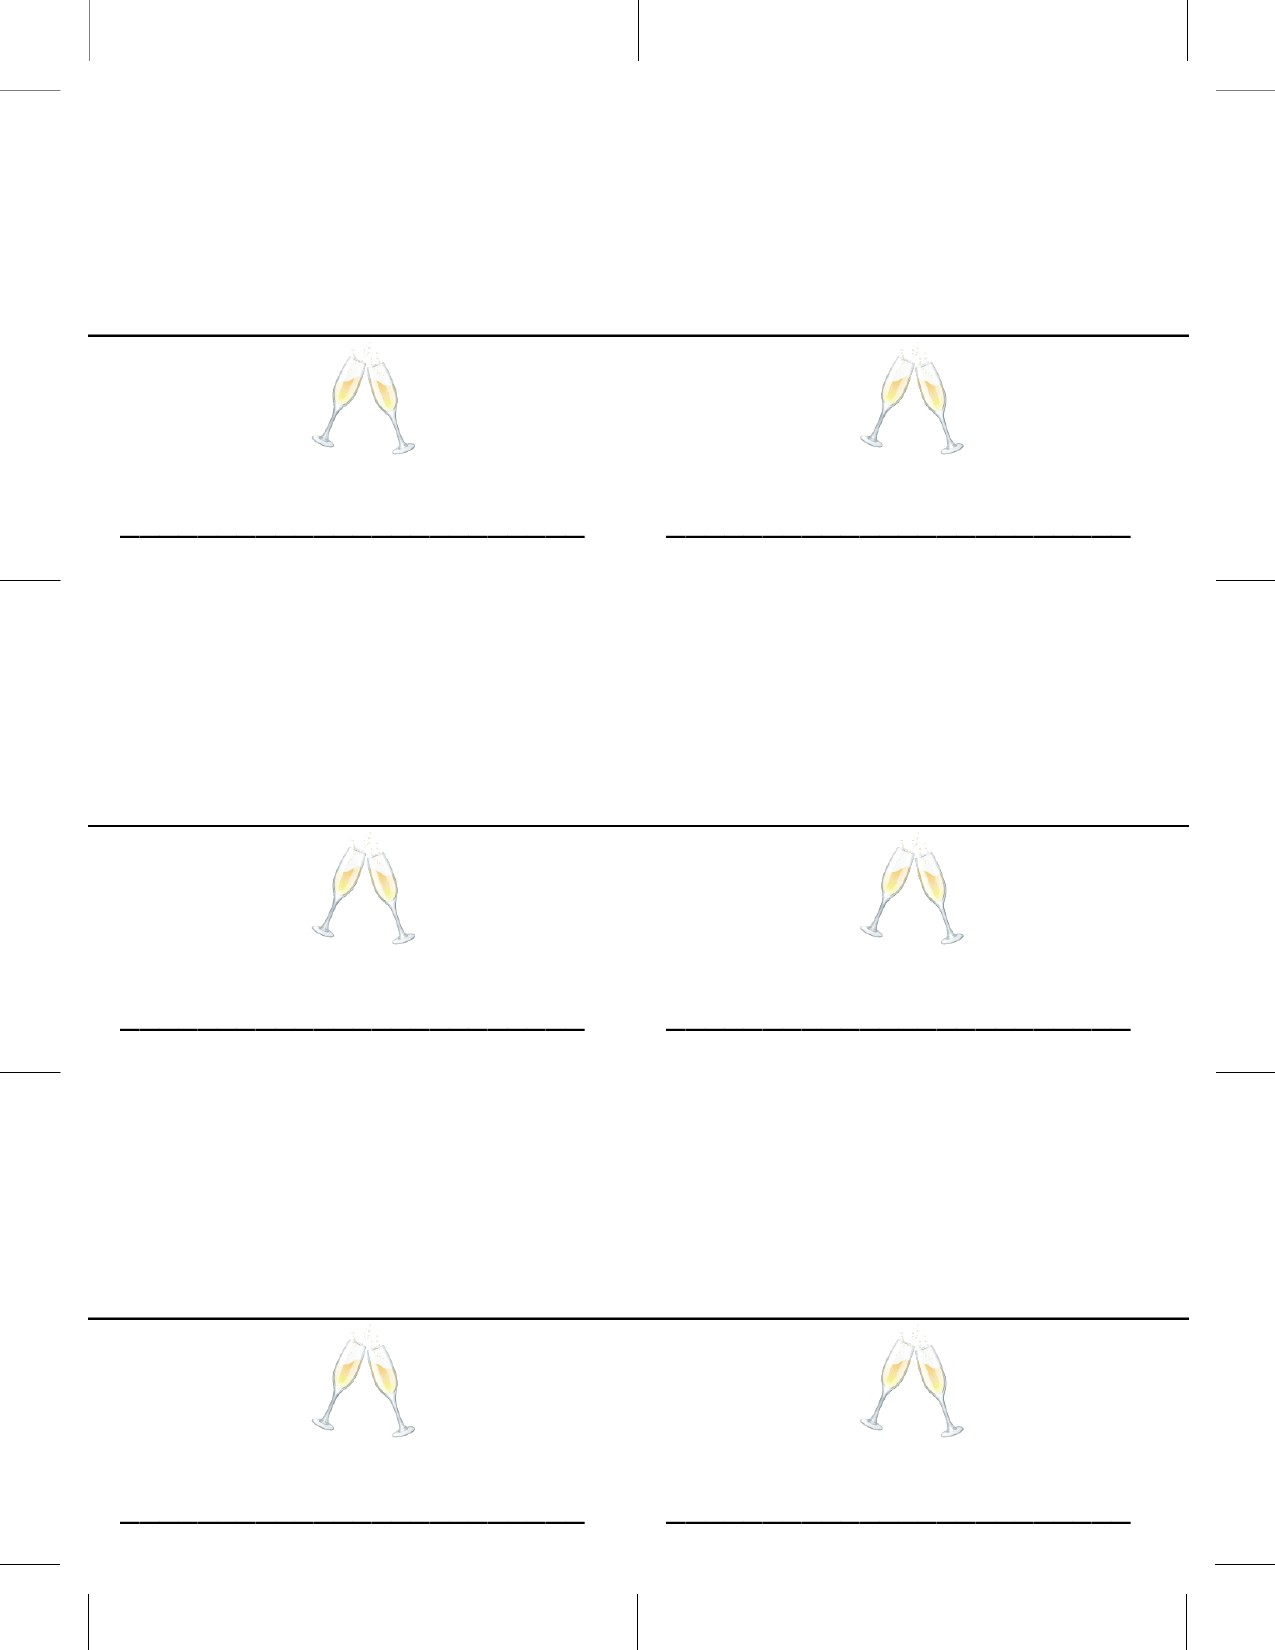 Place Card Templates 21 Per Sheet Regarding Free Template For Place Cards 6 Per Sheet